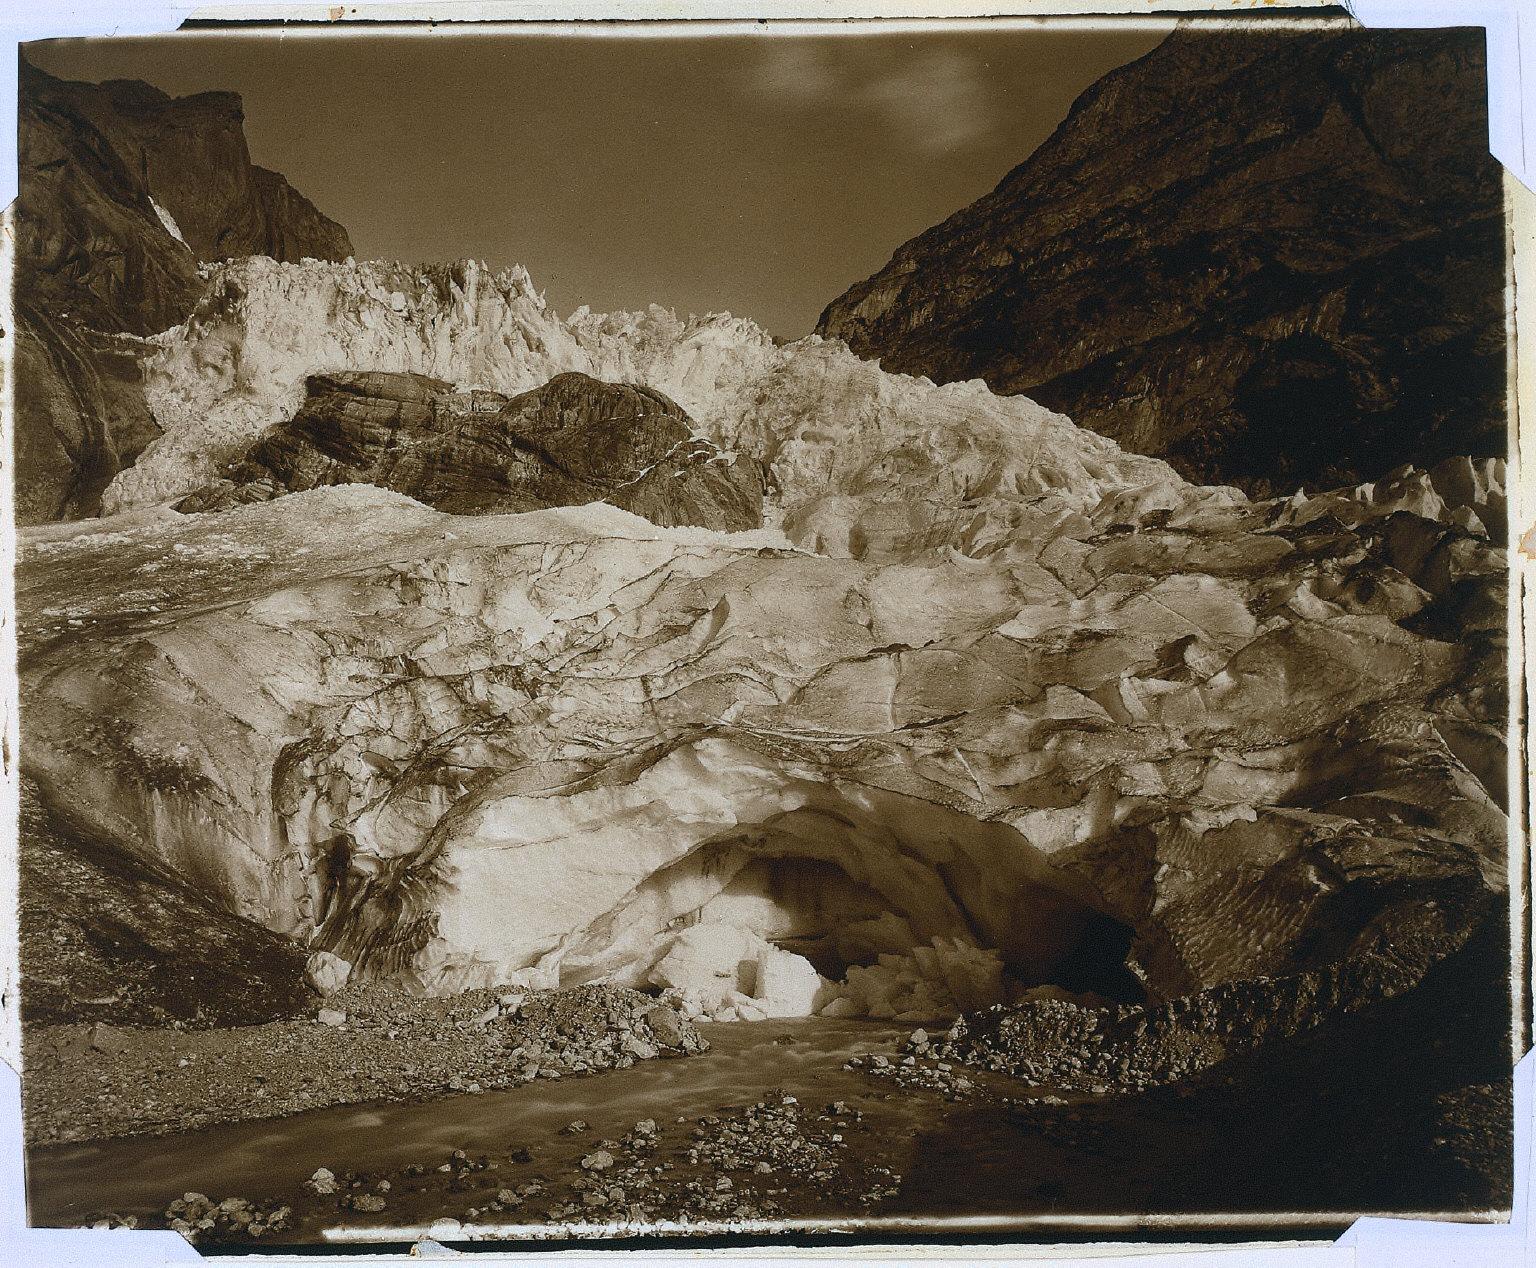 Suisse. Grindelwald, glacier supérieur, source de la Lutschine